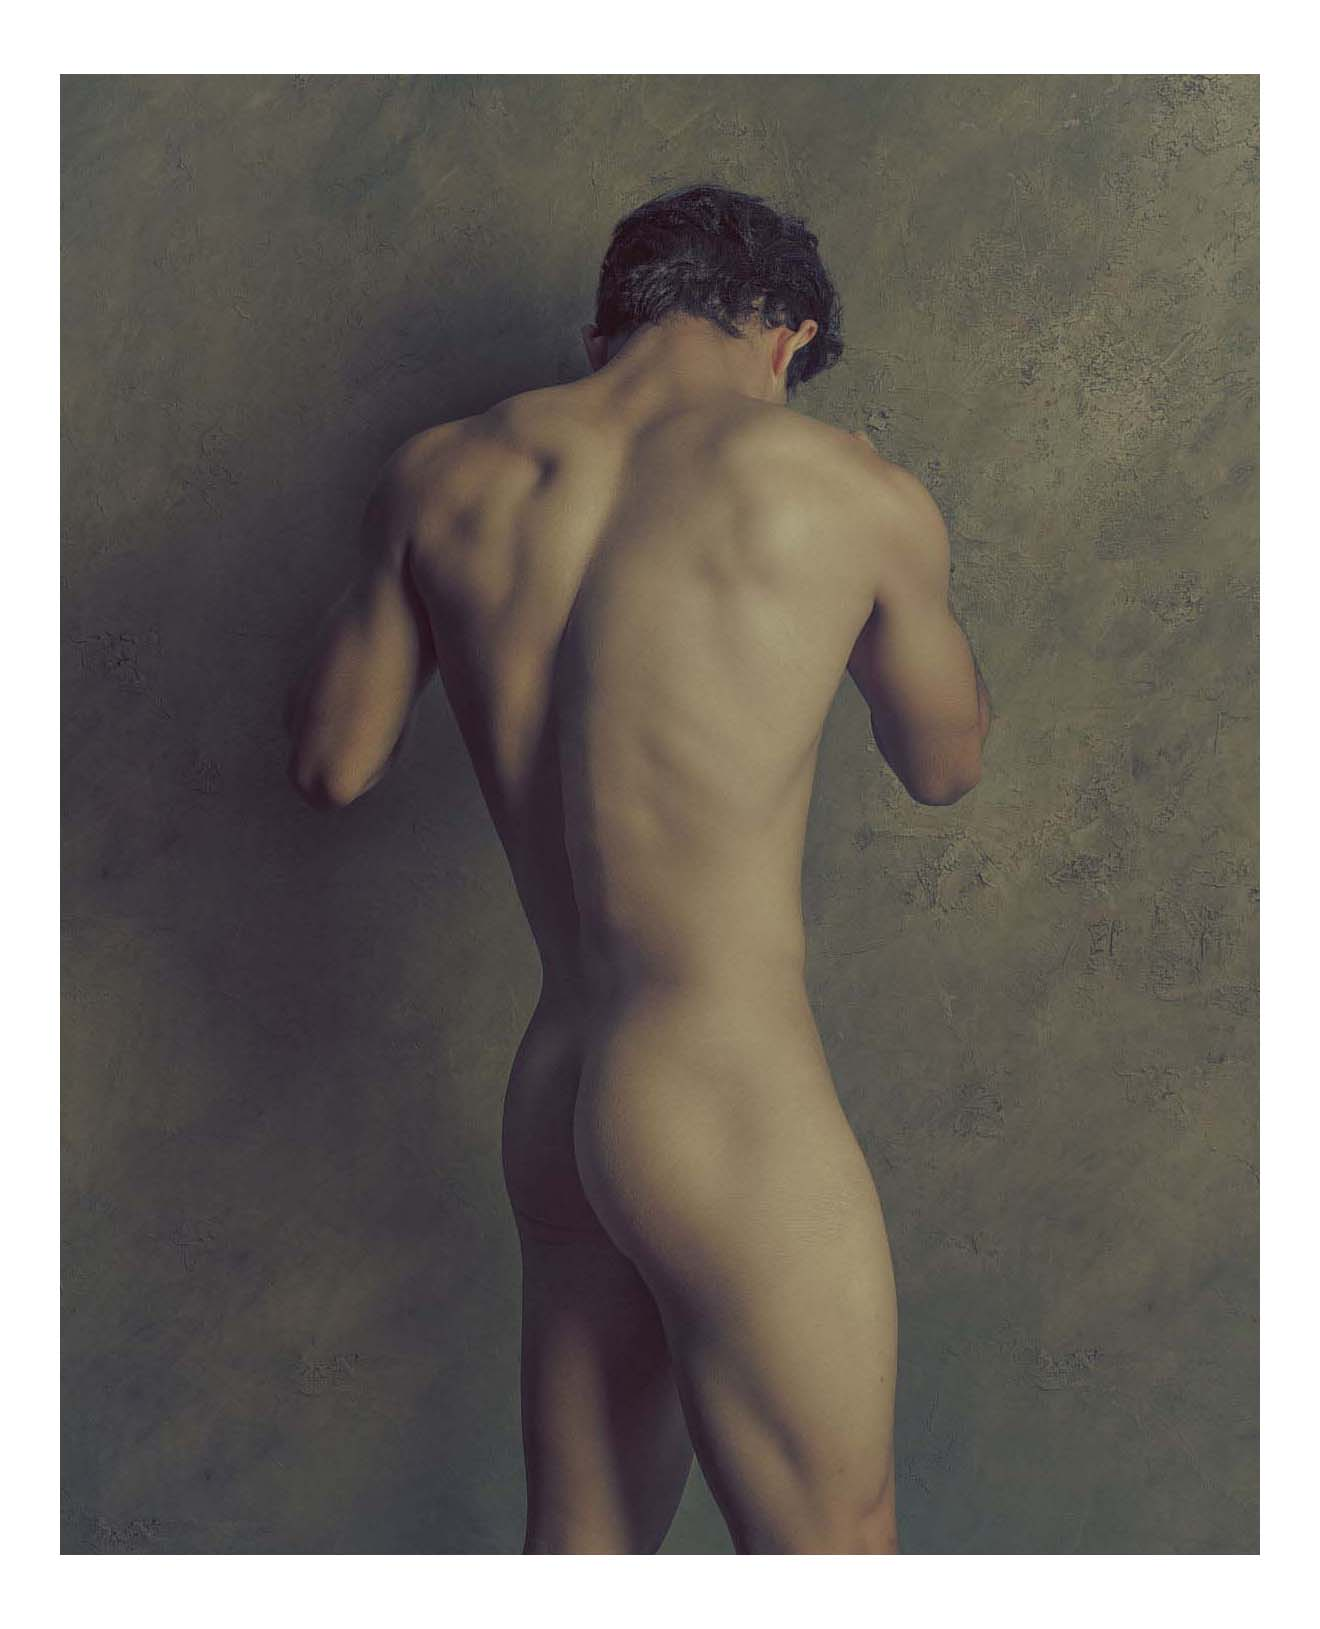 male nude back view standing sculpture by troy schooneman.jpg